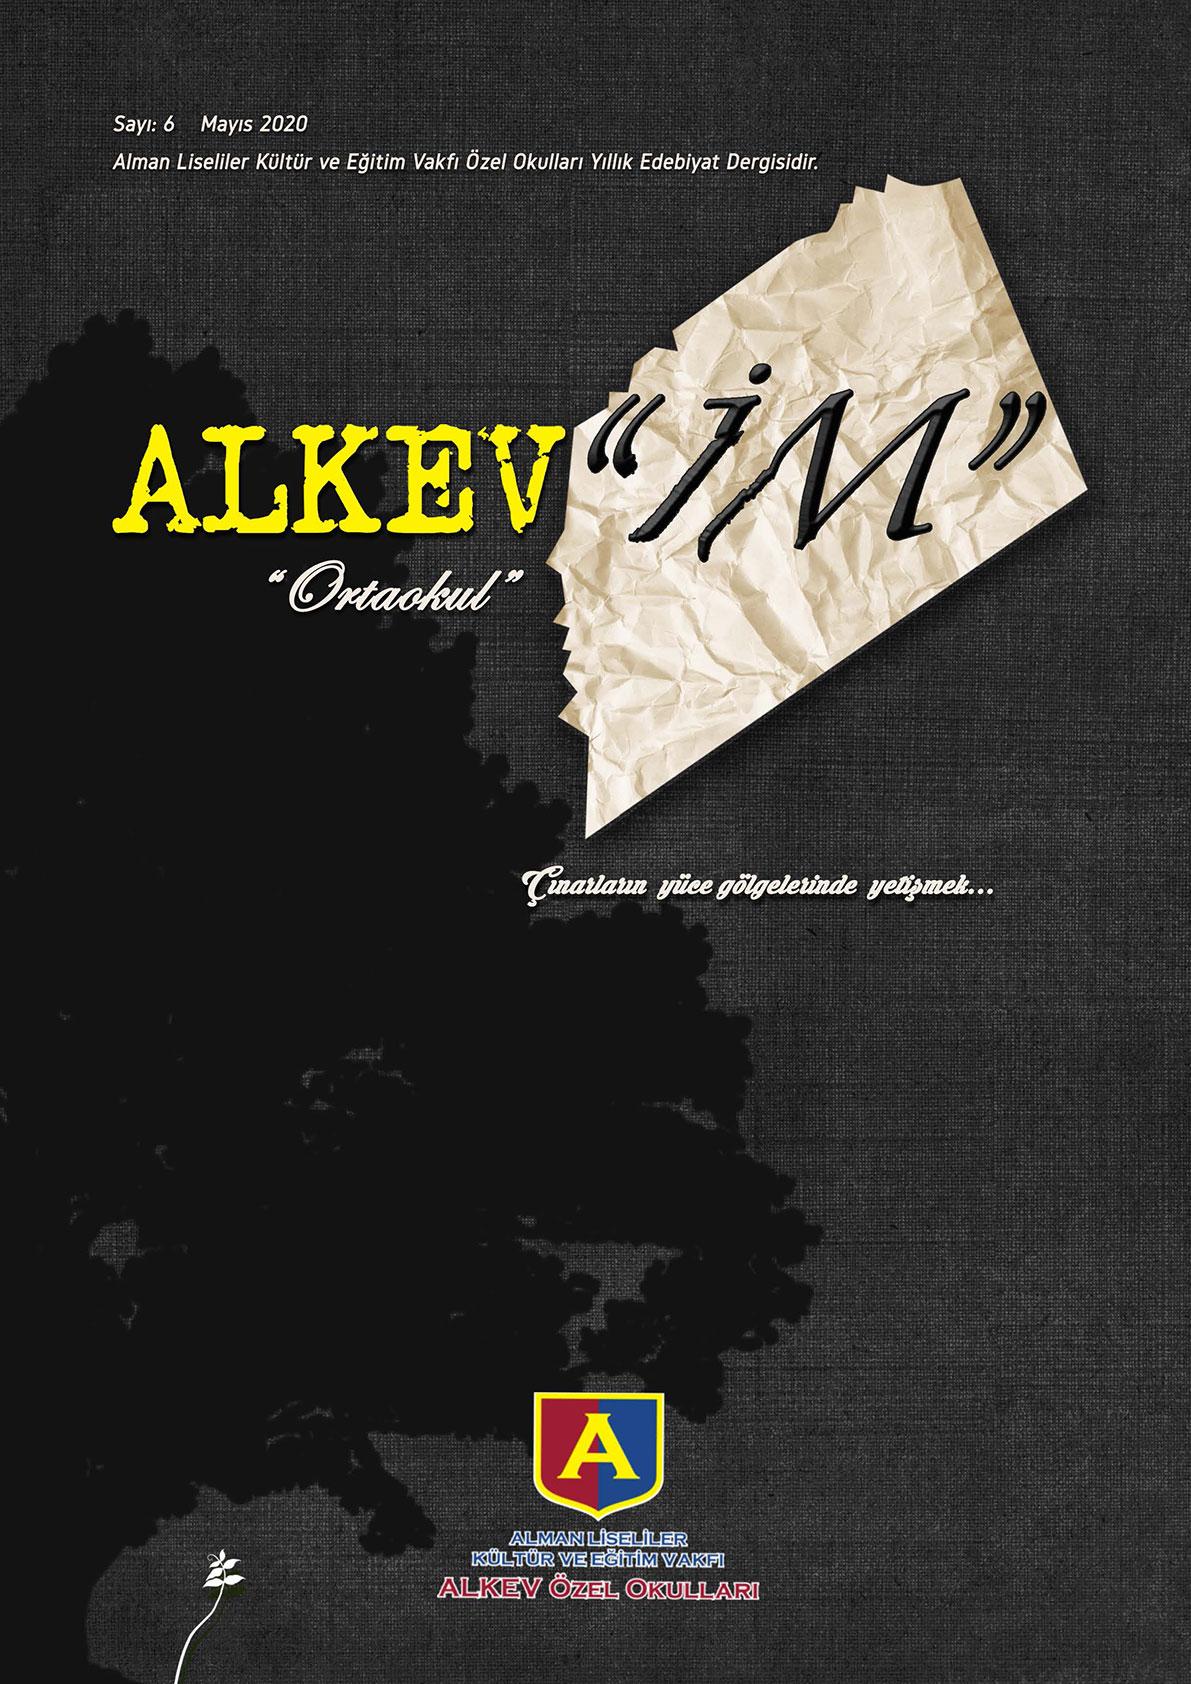 ALKEV'İM' Ortaokul - Sayı: 6 / Mayıs 2020